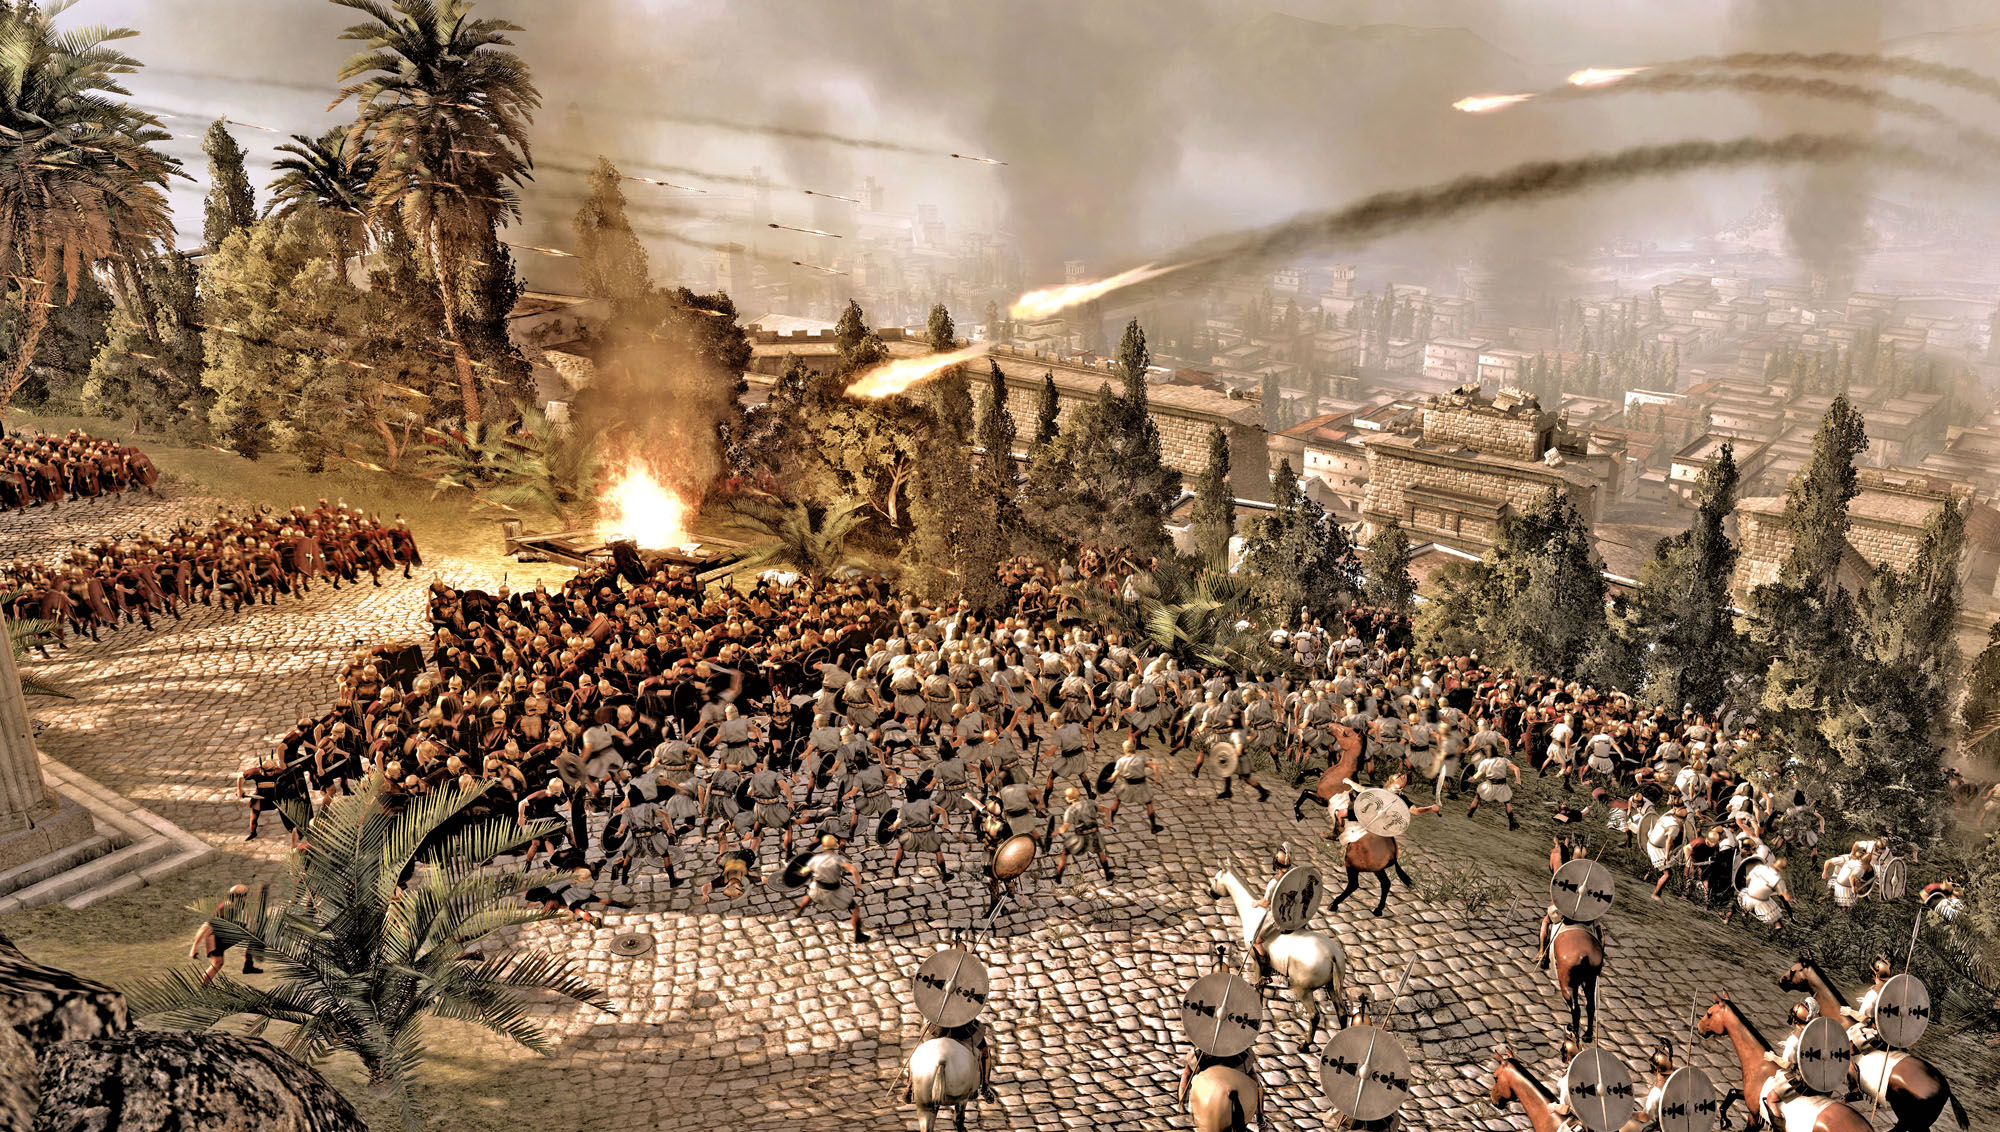 Nuevo trailer de Total War: Rome II esta de lujo [Video]